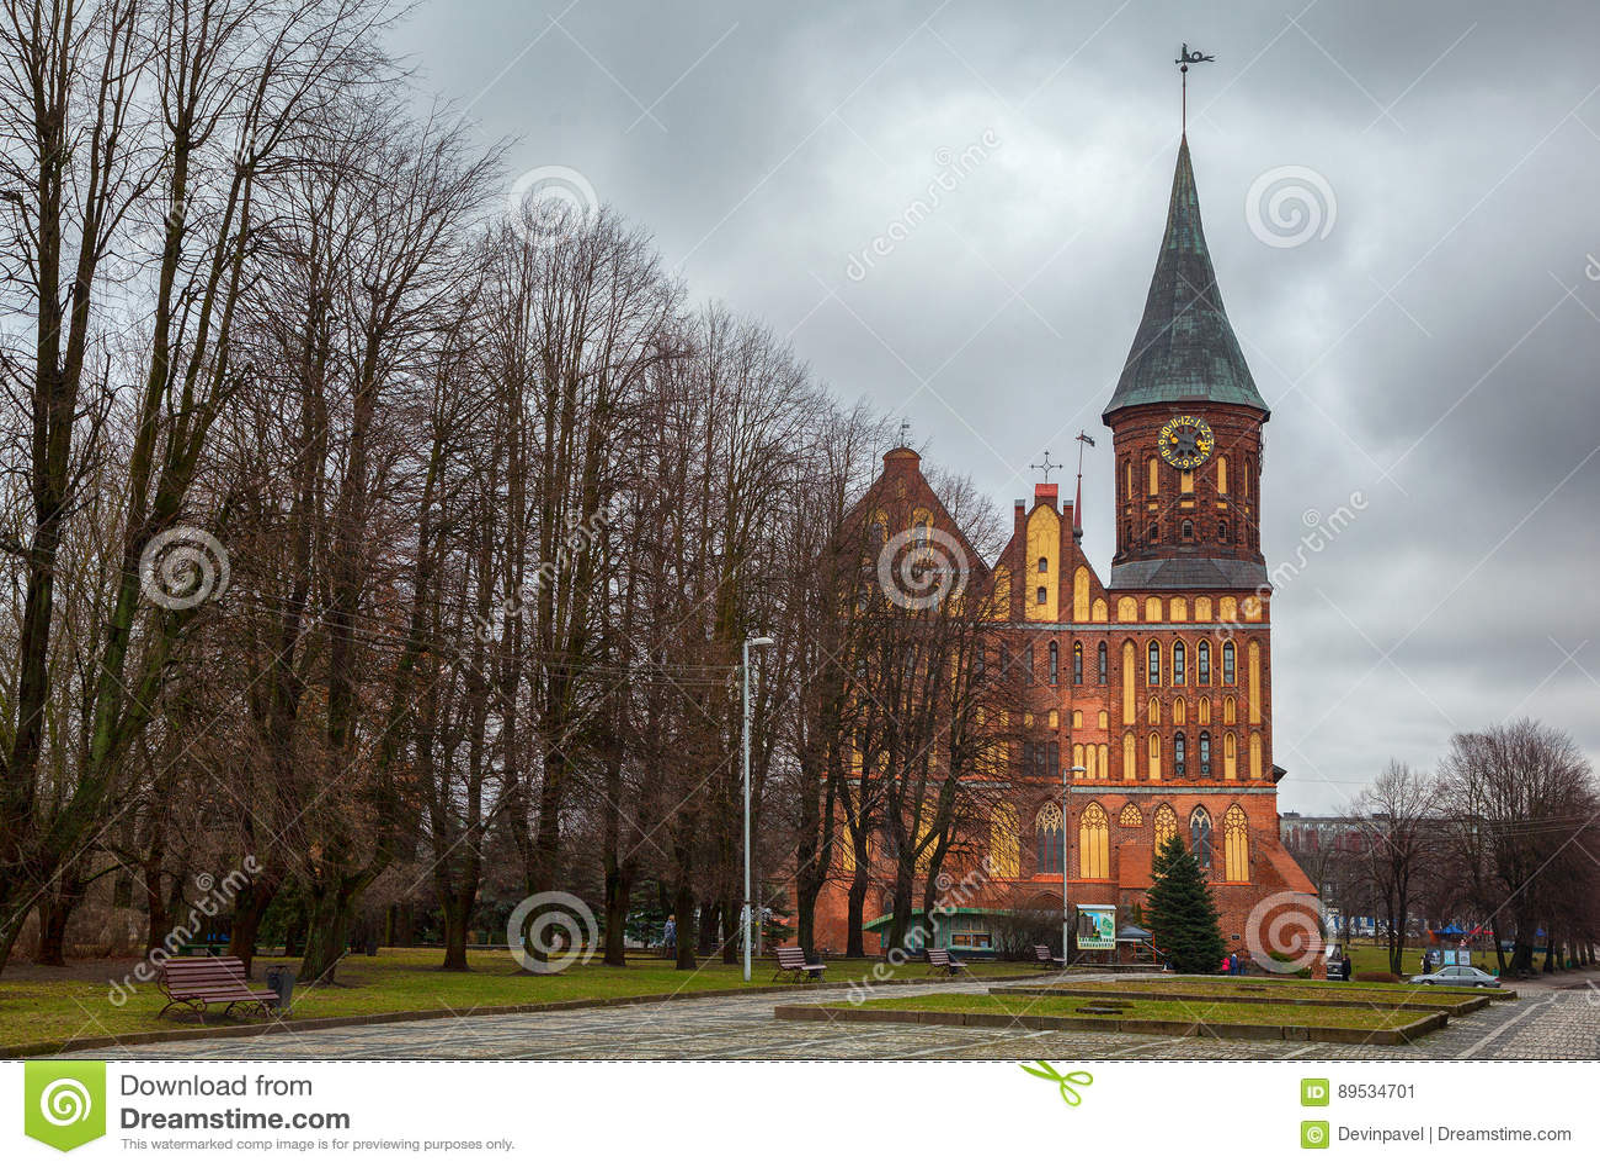 The cathedral in Kaliningrad. Kaliningrad: sightseeing